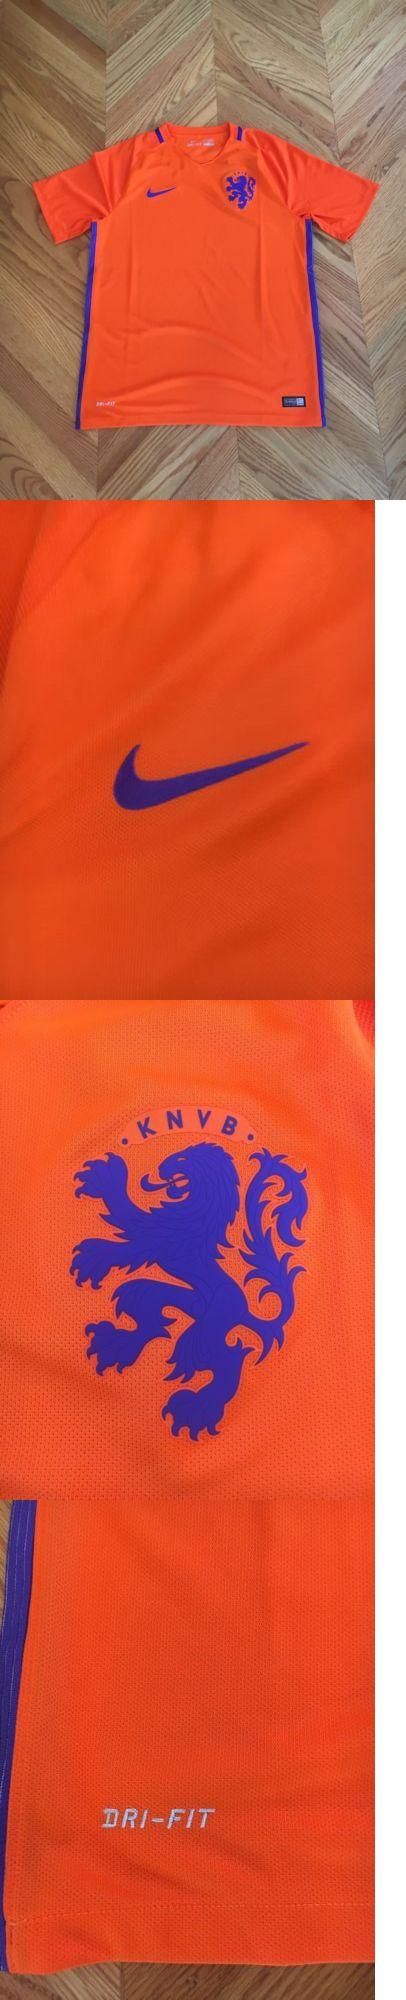 Soccer-National Teams 2891: Nike 2016 2017 Netherlands Soccer Football Kit Jersey Mens Medium Orange -> BUY IT NOW ONLY: $64.95 on eBay!